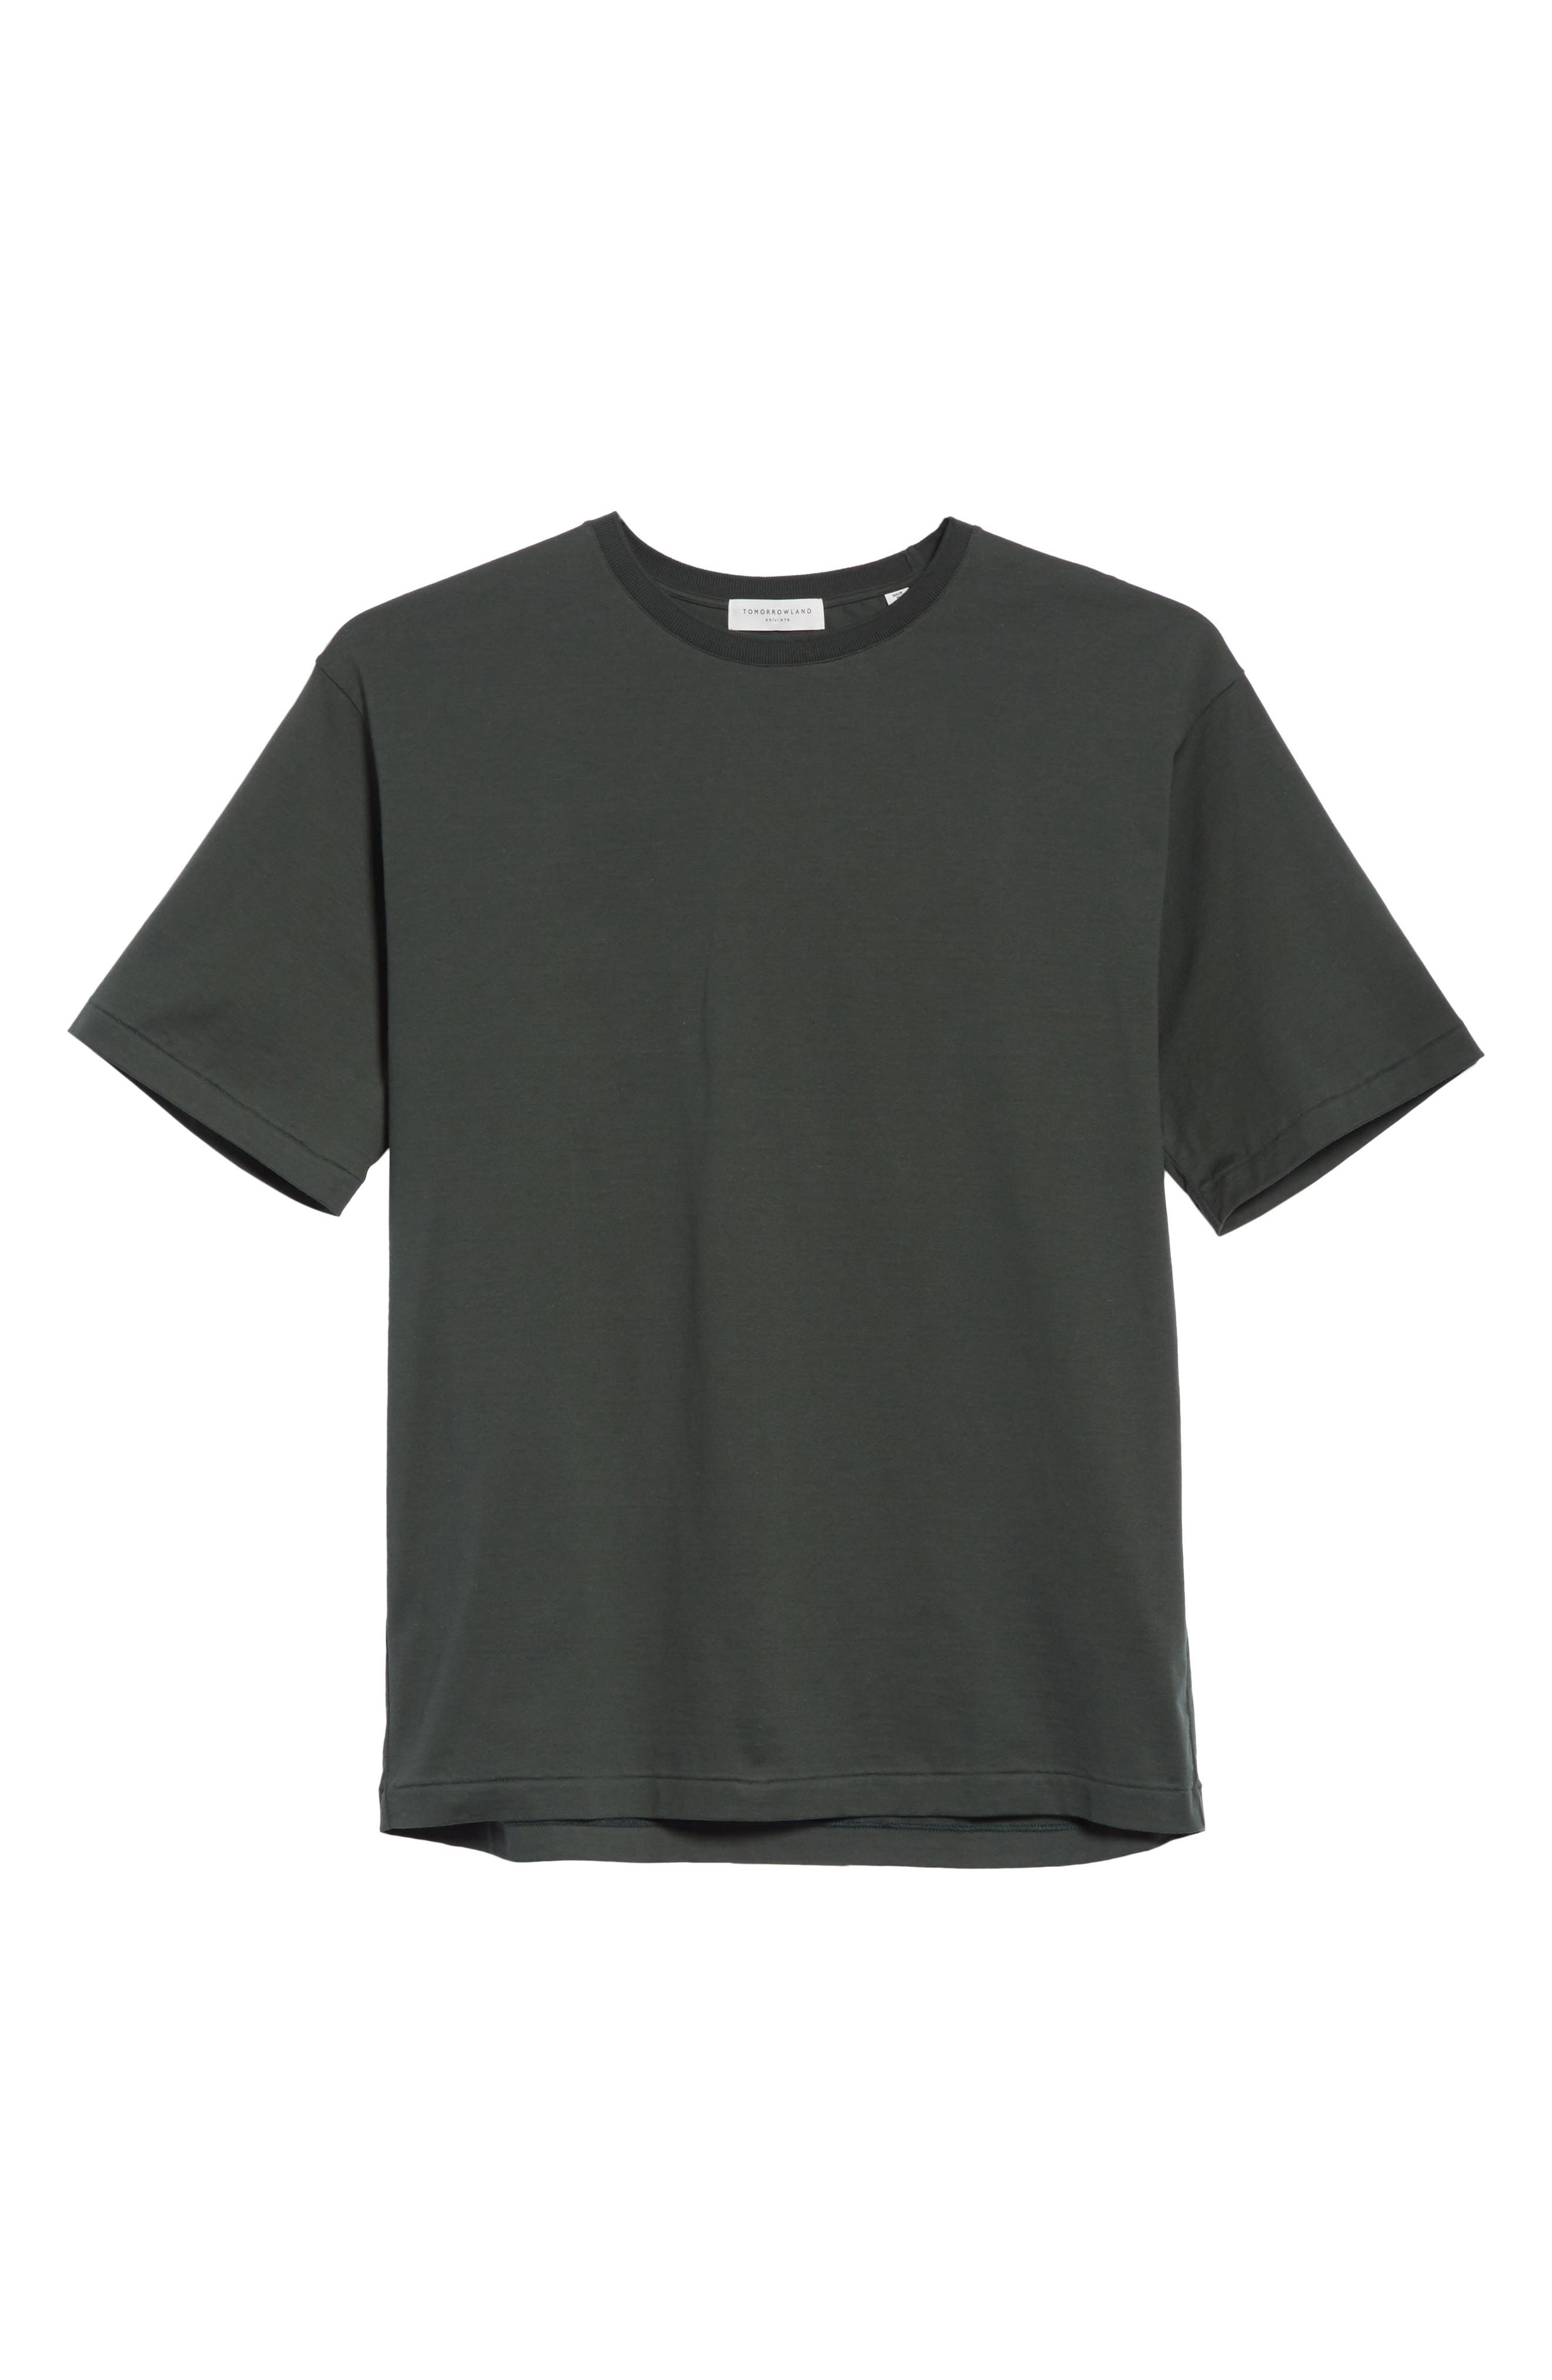 Jersey T-Shirt,                             Alternate thumbnail 6, color,                             300